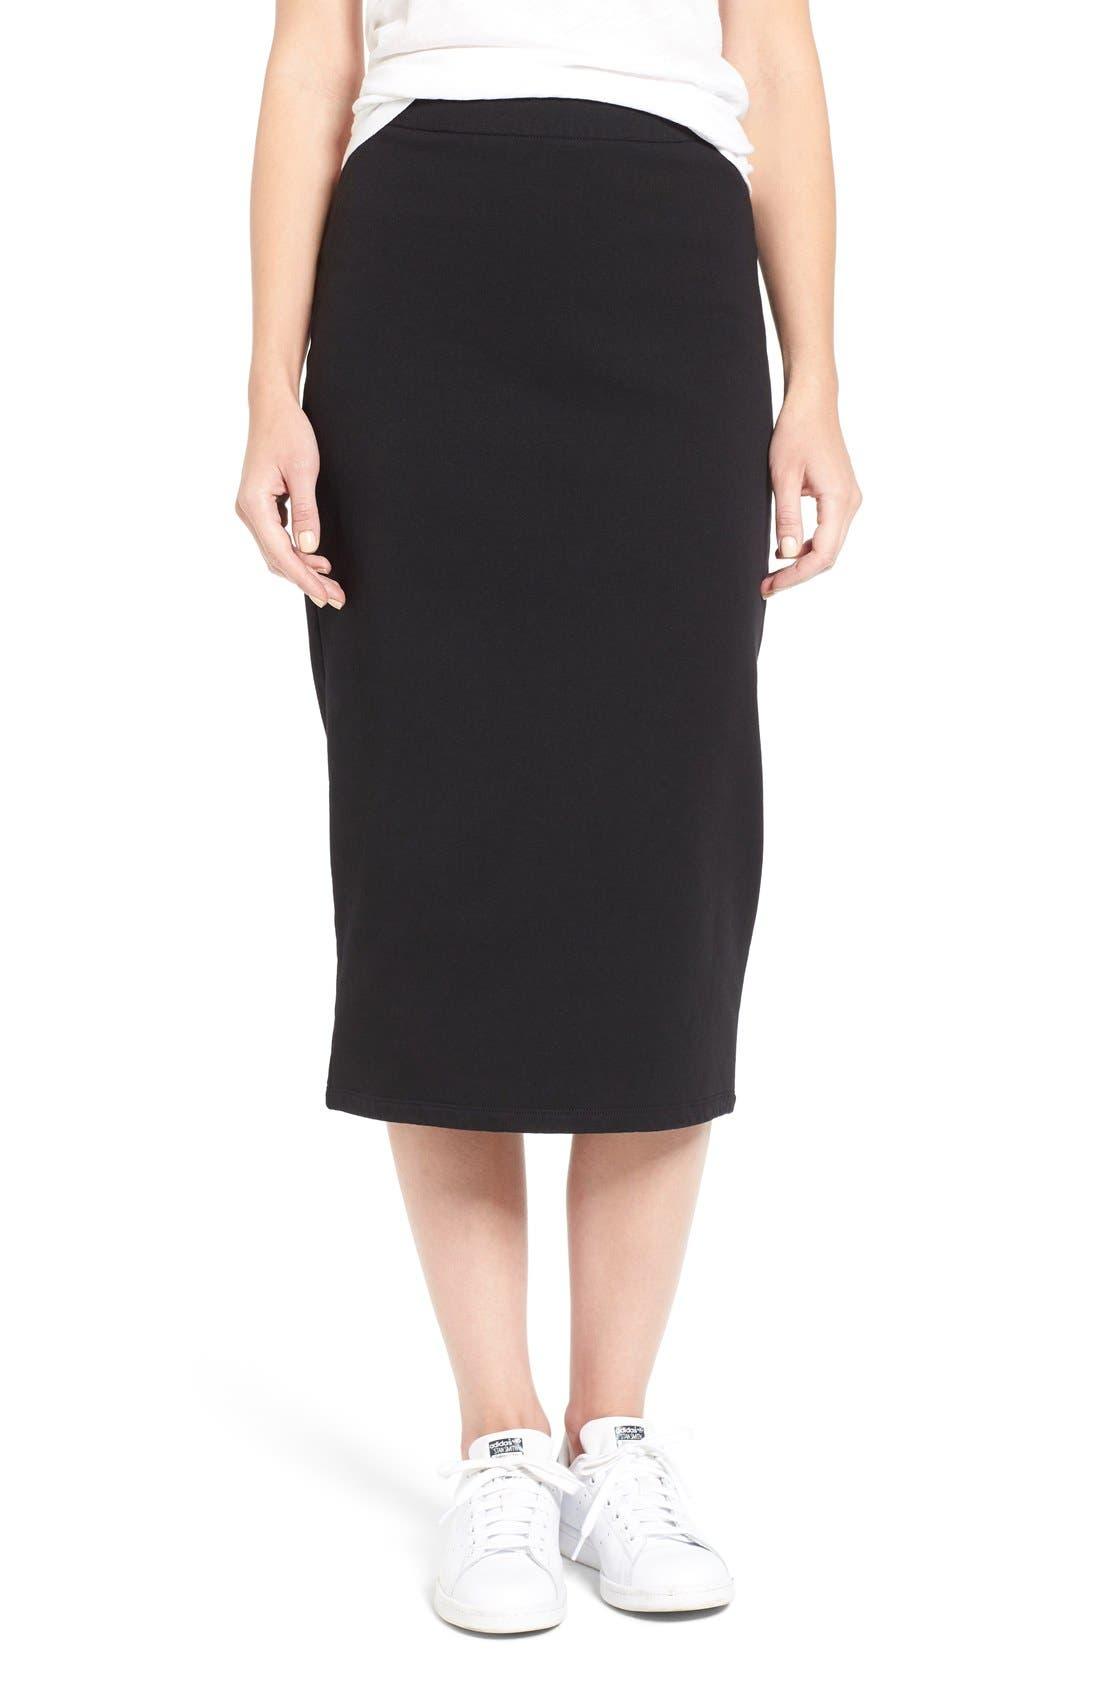 Alternate Image 1 Selected - James Perse Stretch Fleece Pencil Skirt